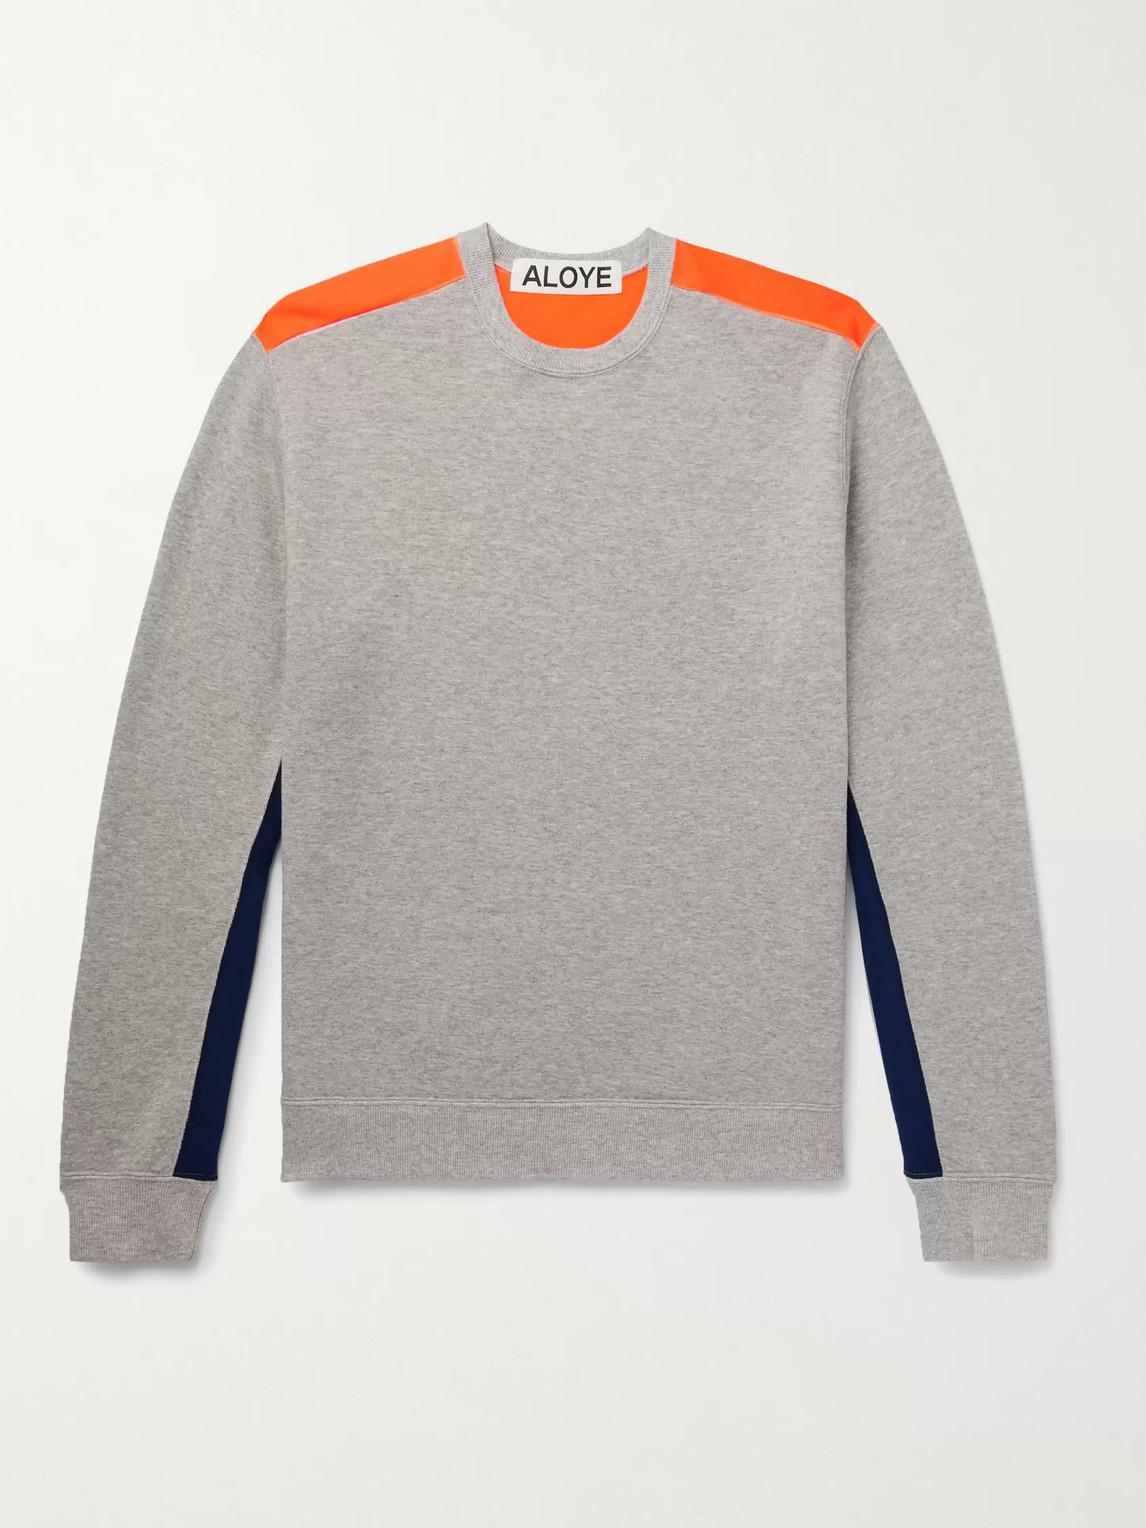 Aloye Colour-block Mélange Loopback Cotton-jersey Sweatshirt In Gray